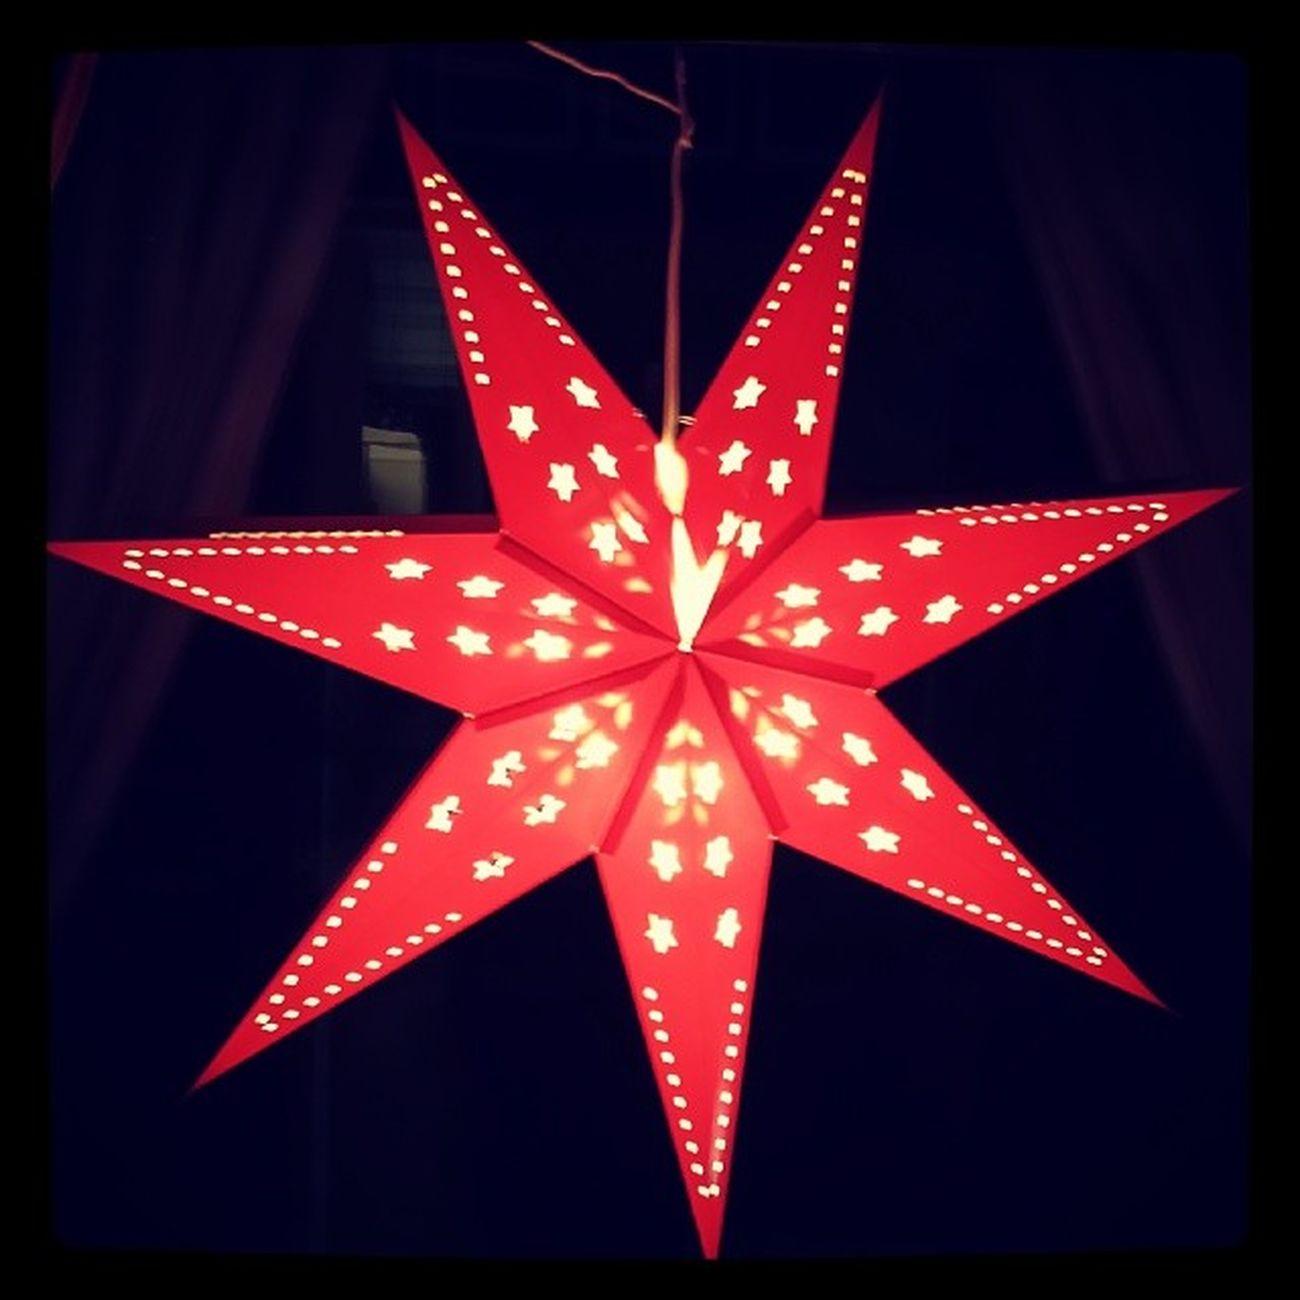 Christmas spirit everywhere ★☆★☆★ Christmasspirit Chrismastime Christmasdecoration Christmas2013 christmaswish christmas christmasiscoming christmaslights decoration bestoftheday instapic loveit